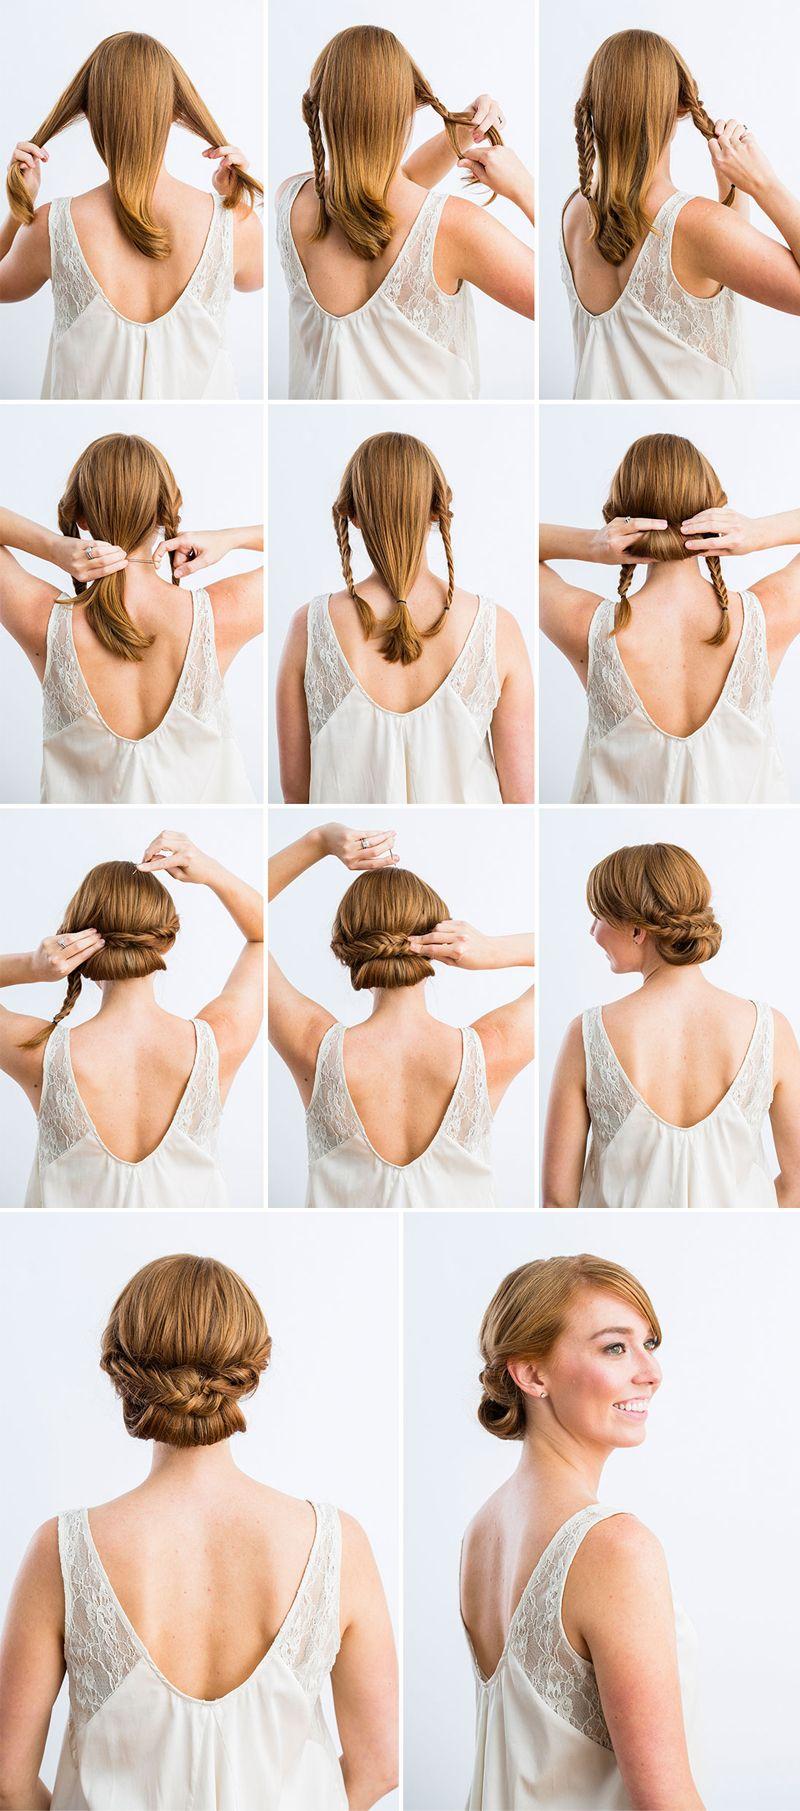 10 best diy wedding hairstyles with tutorials | diy wedding hair